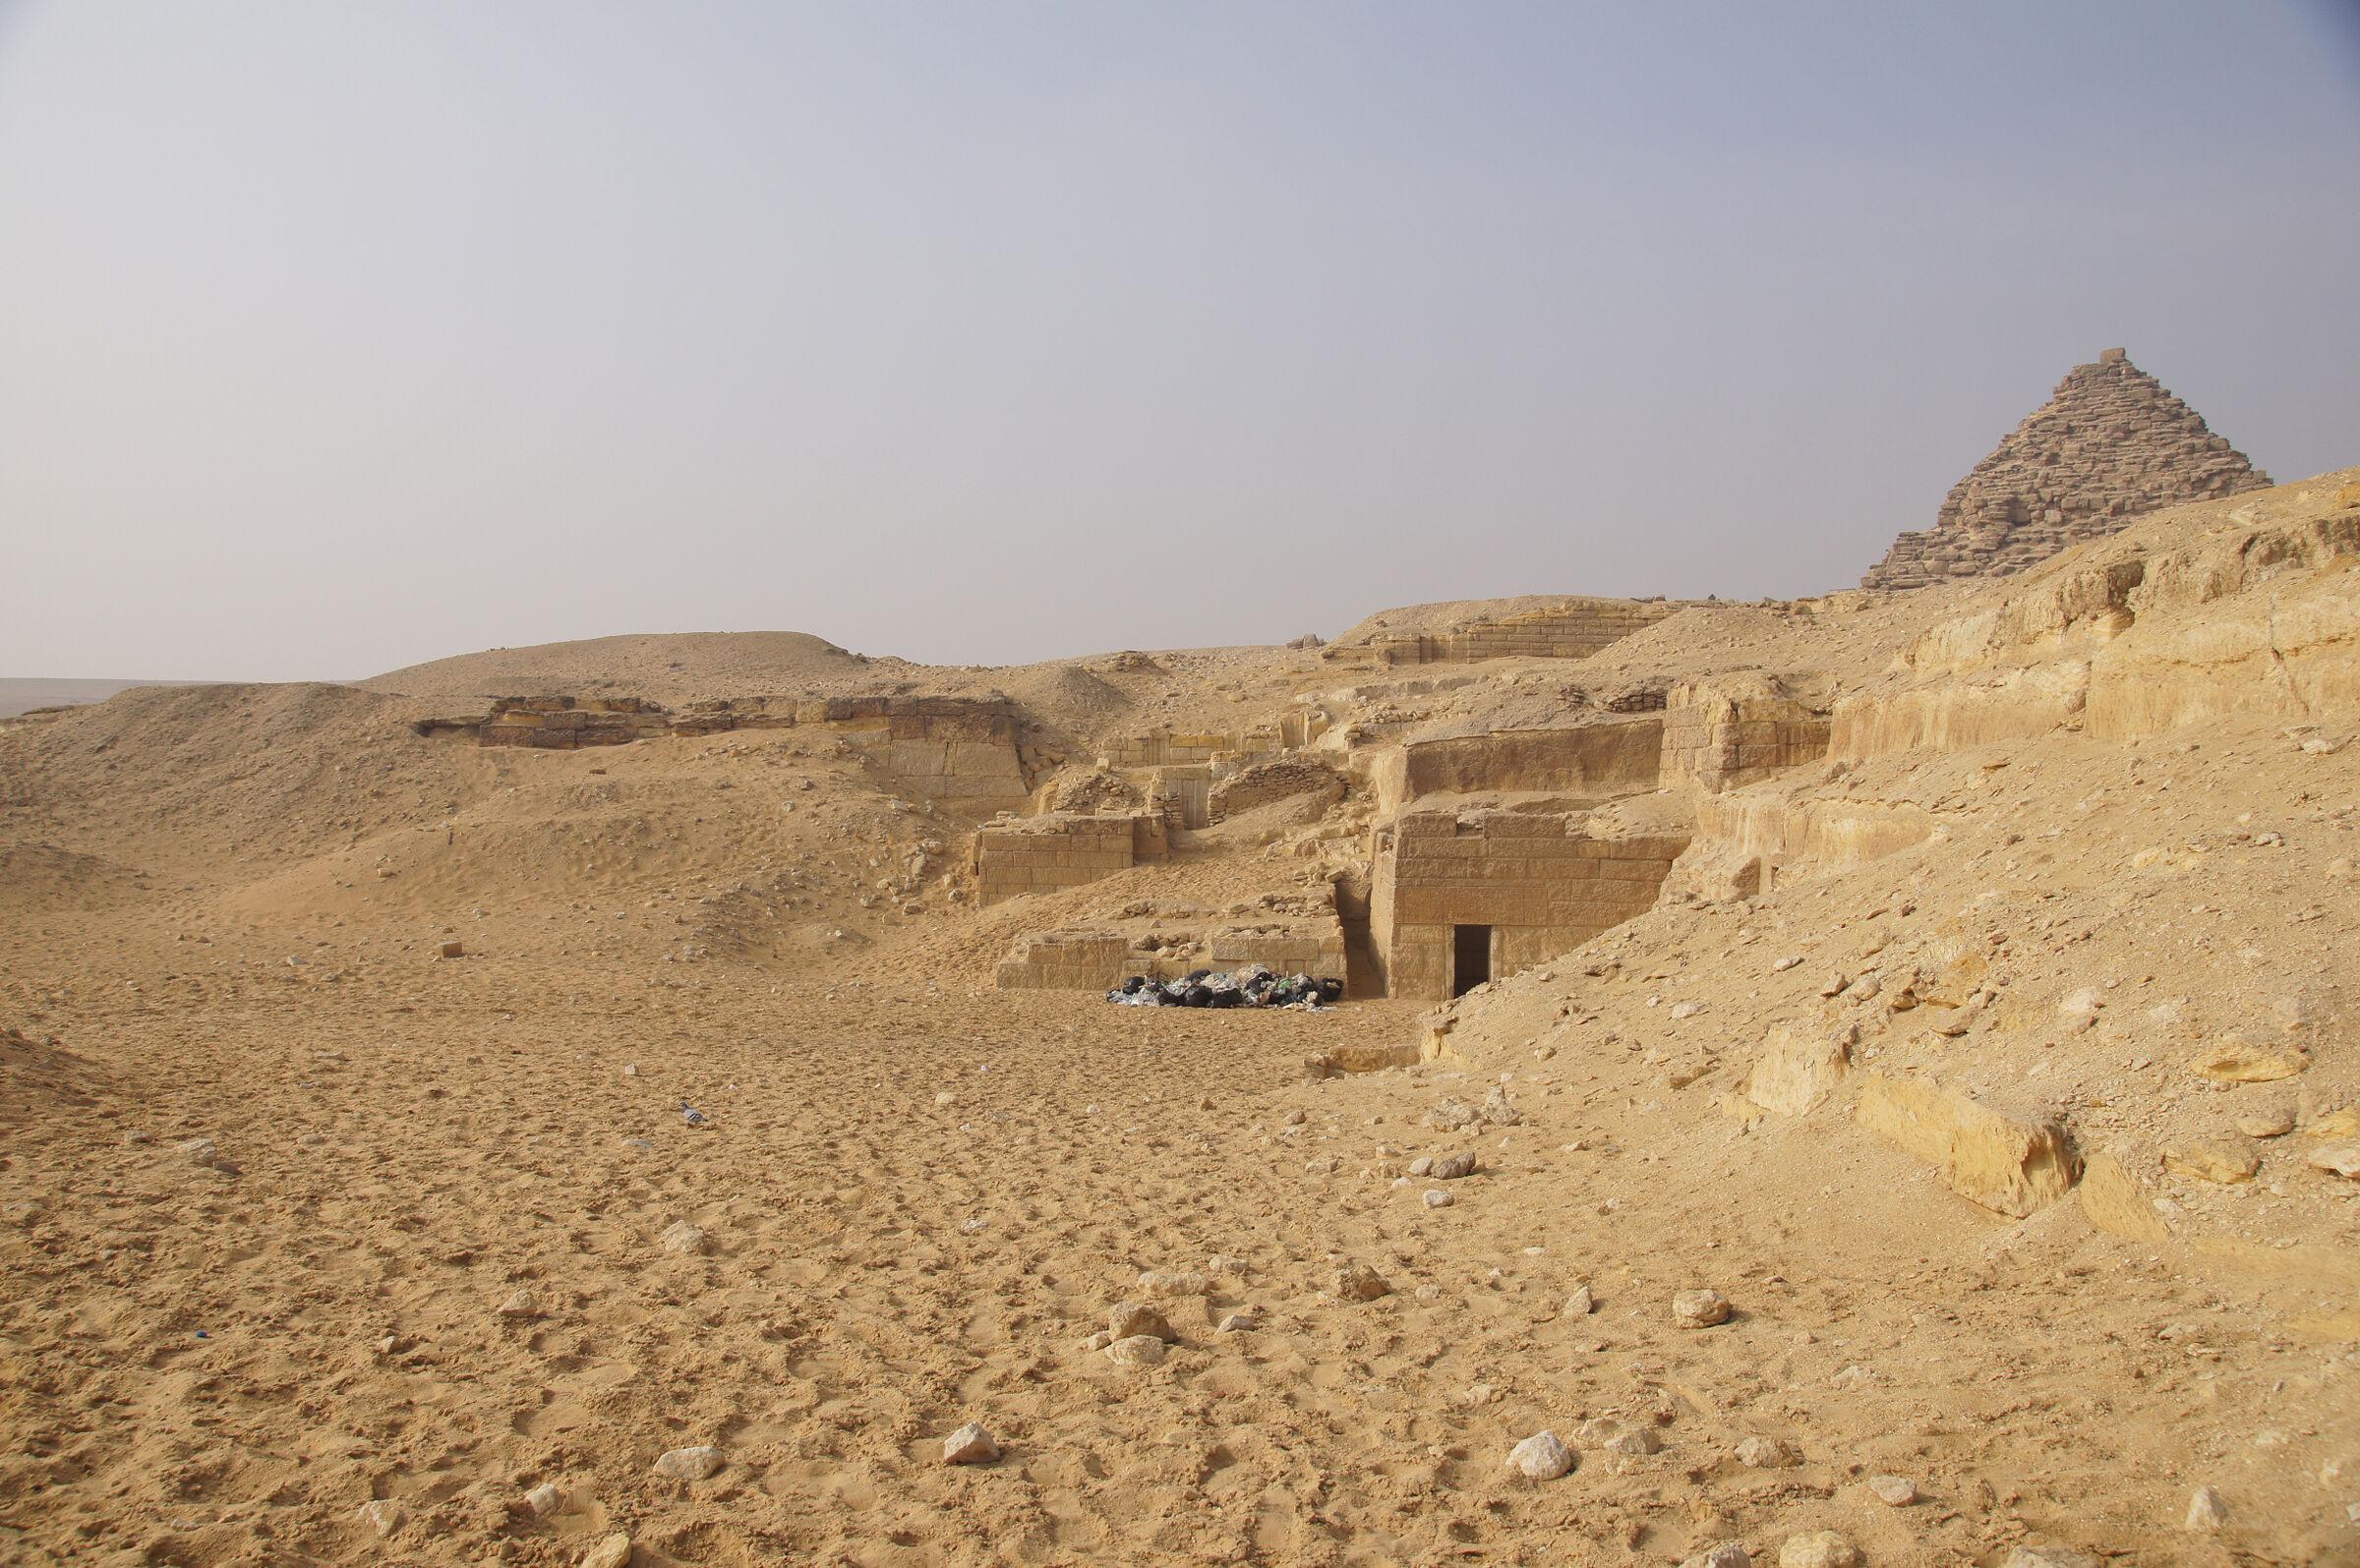 Menkaure Quarry Cemetery: Site: Giza; View: MQ 1, MQ 136, MQ 123, MQ 106, MQ 105, MQ 134, MQ 120, MQ 121, MQ 130, MQ 132, MQ 133